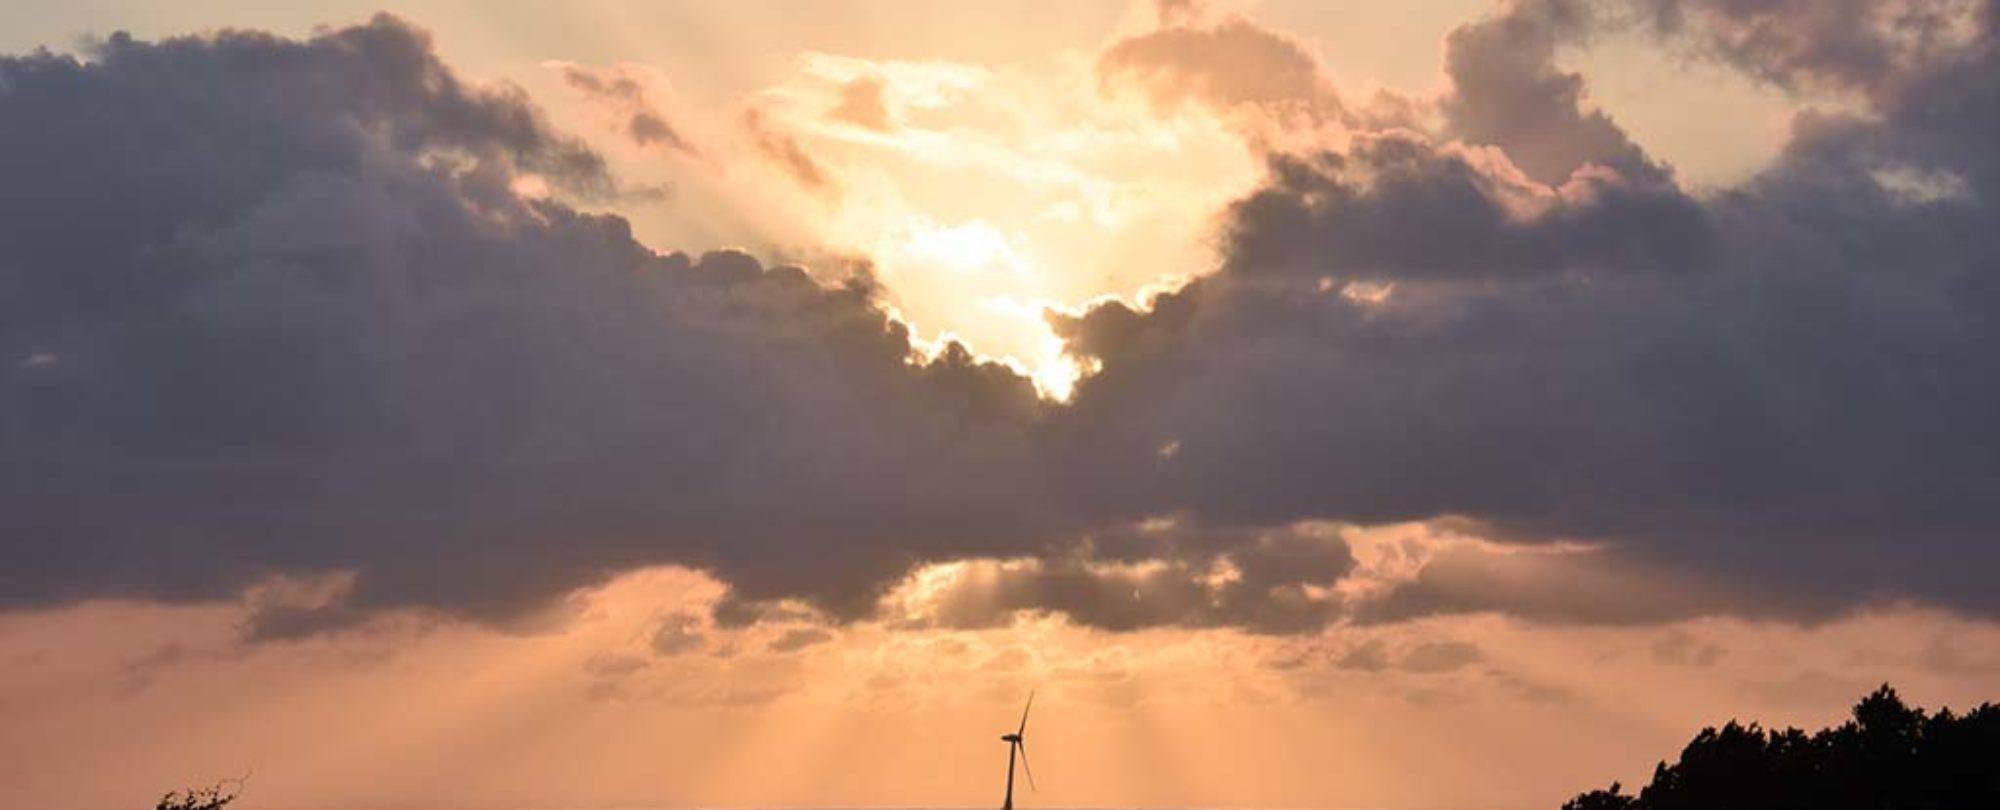 SPACE Long Arms -長崎県五島市の福江島にある海を一望できるコワーキングスペース-